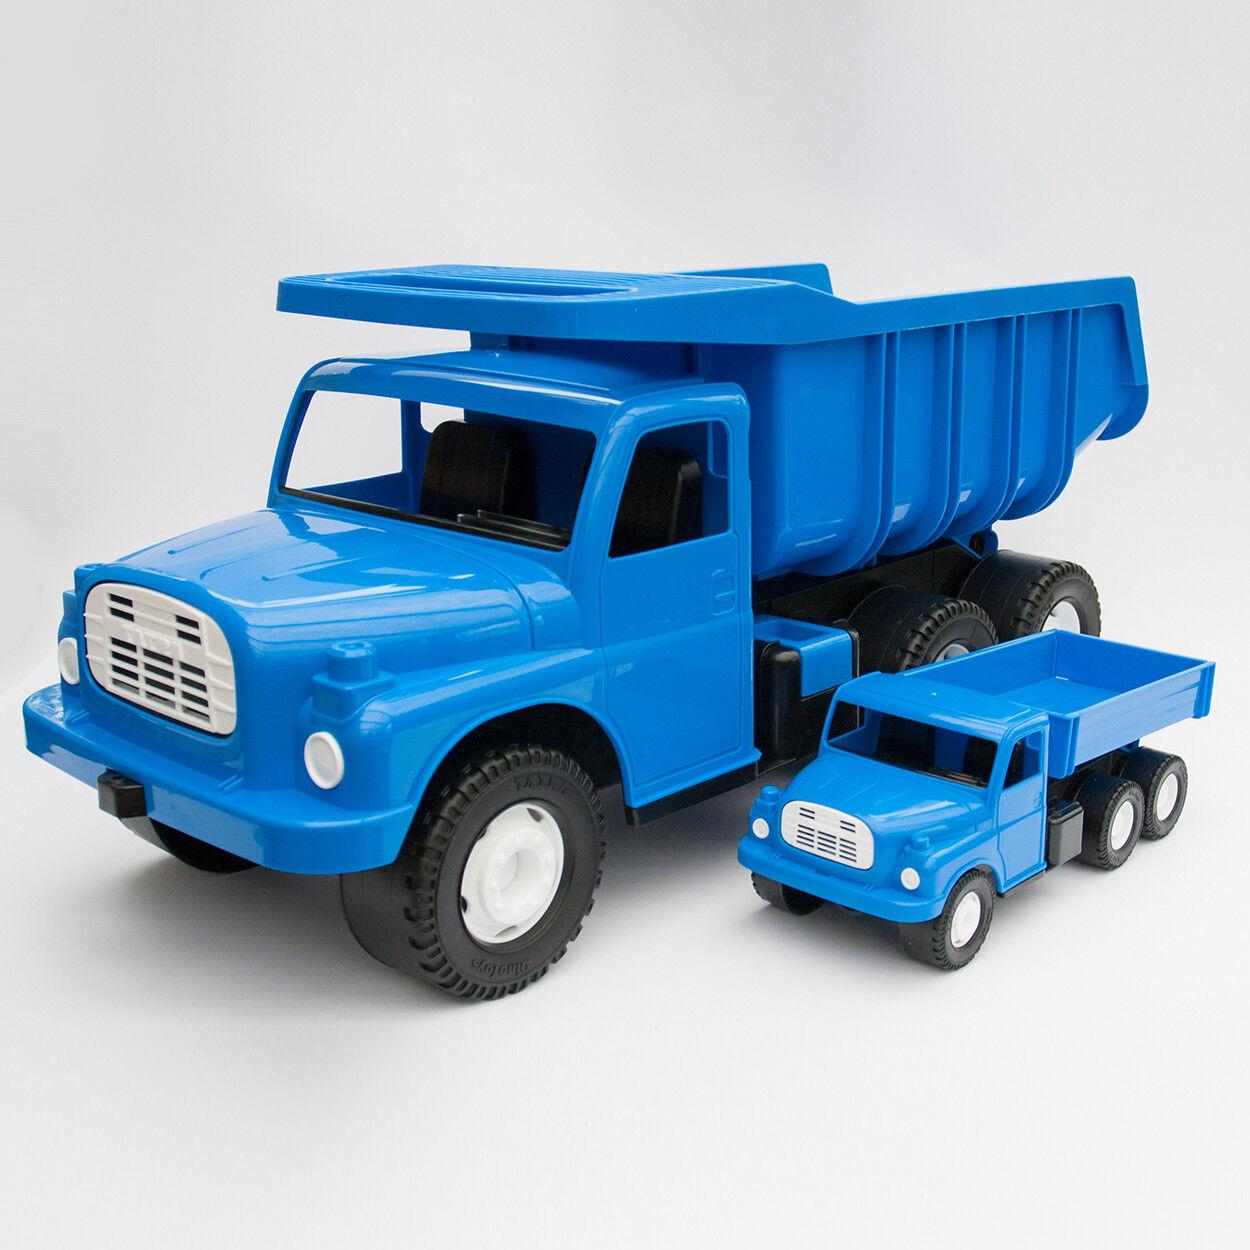 TATRA 148 LKW Spielzeug-Set blau 72&30cm - DDR CSSR-Retro Sandspielzeug